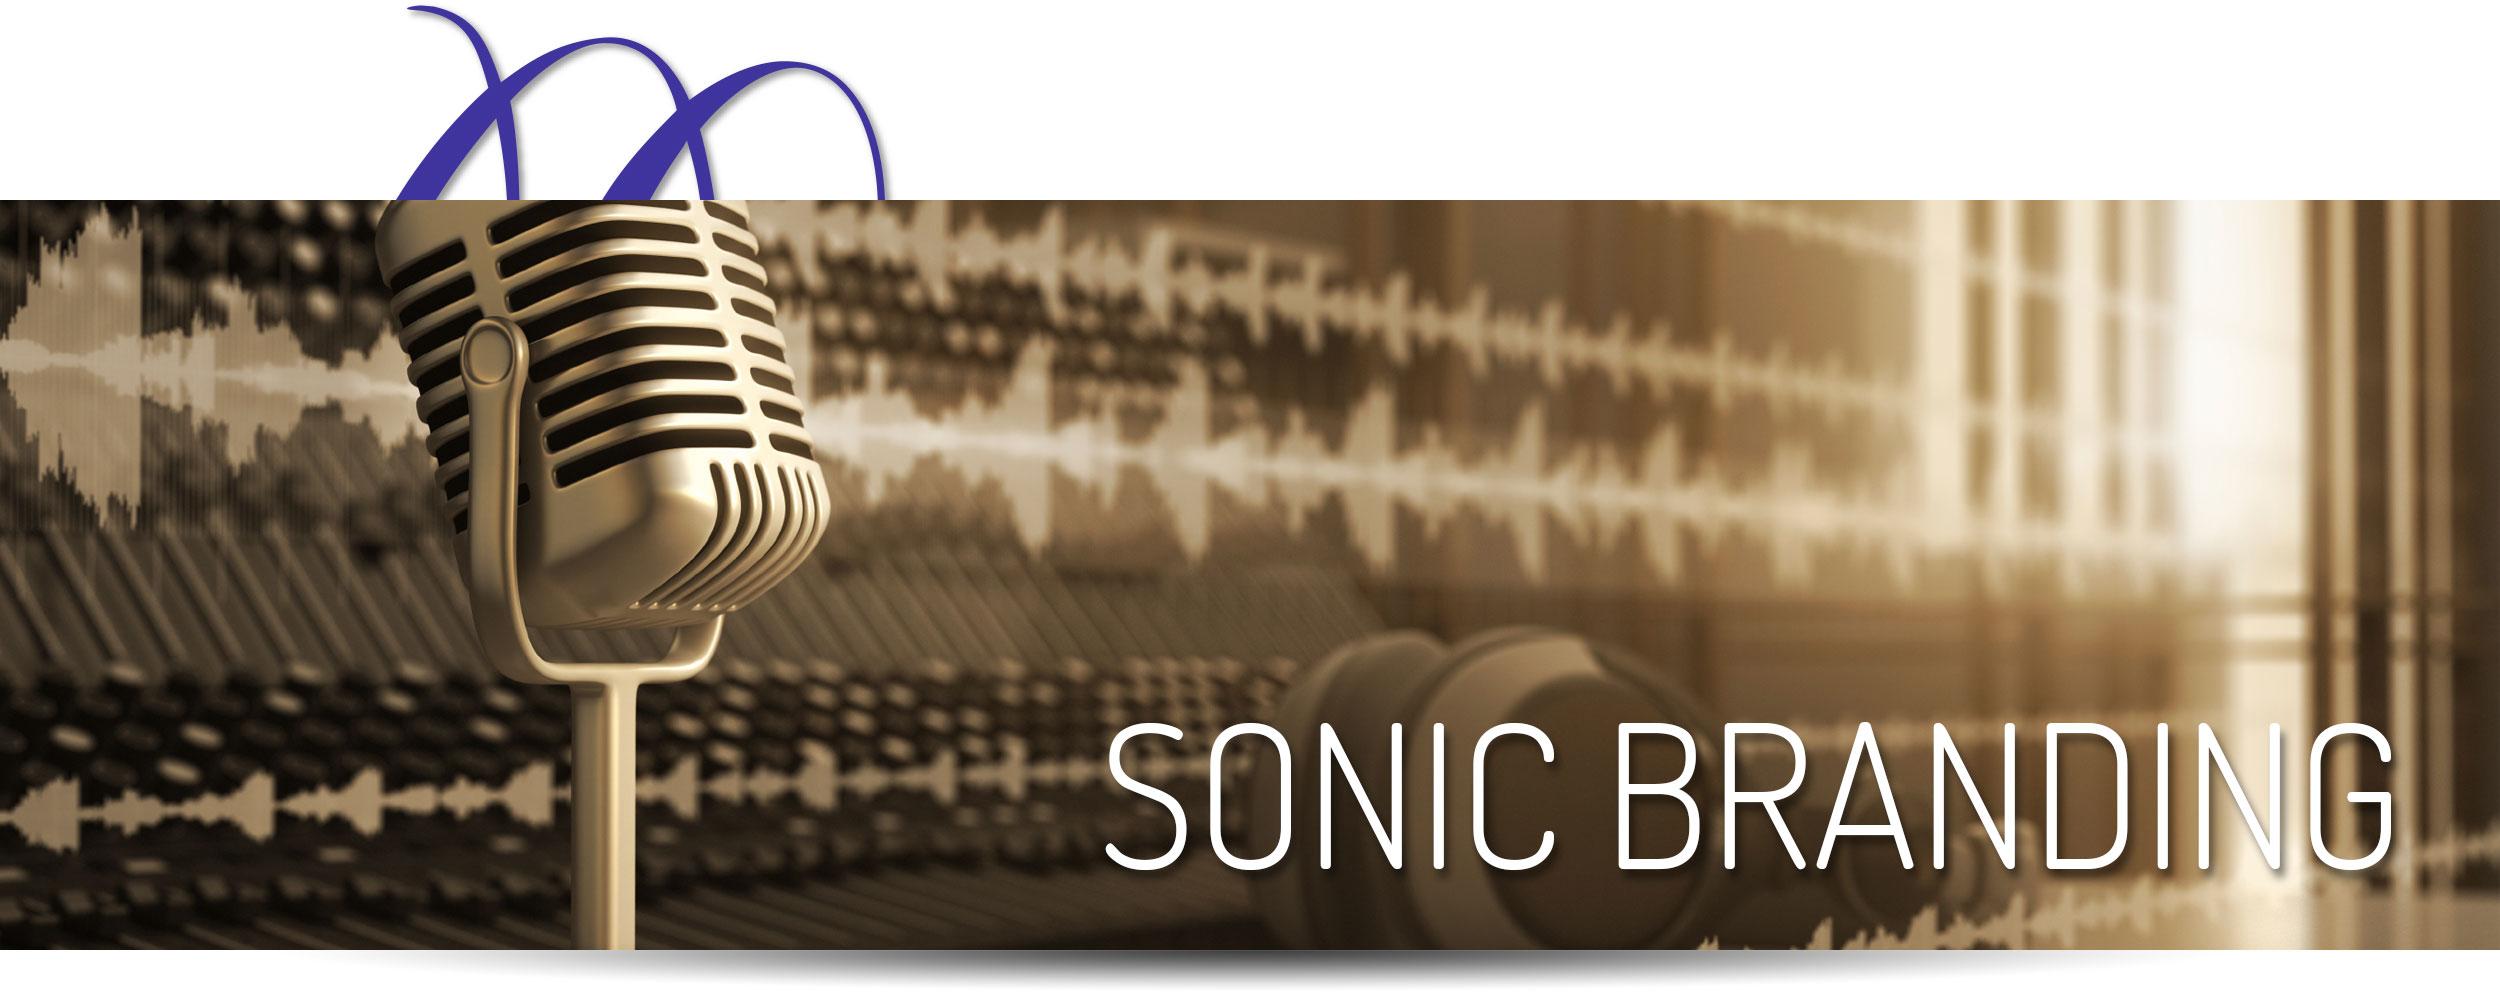 Audio Mnemonics & Sonic Branding